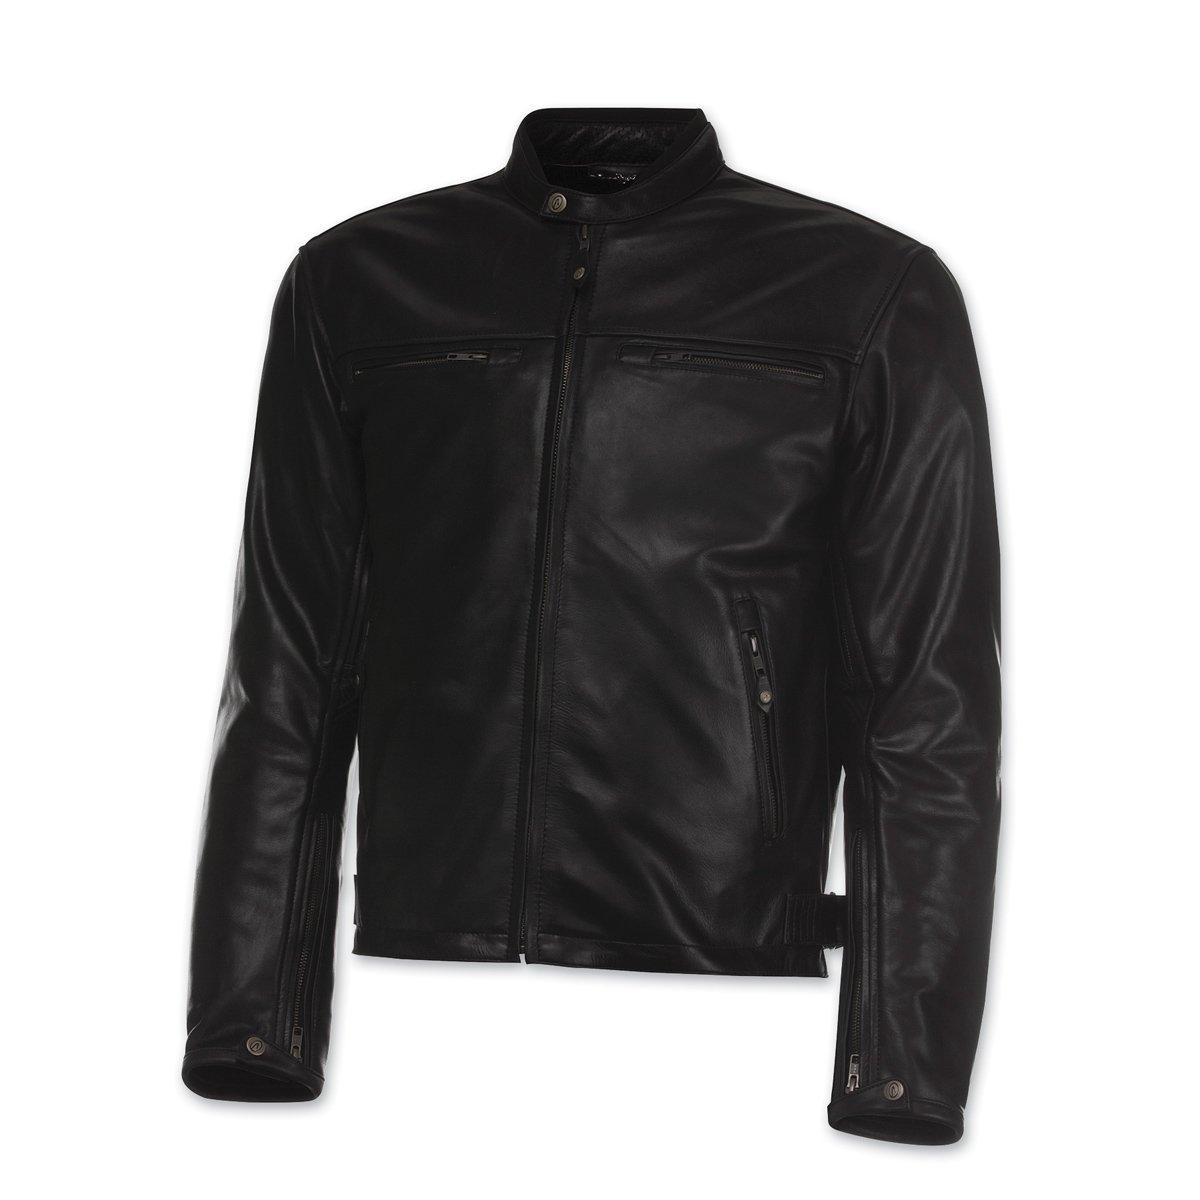 Olympia Moto Sports Men's Bishop Black Leather Jacket, XL